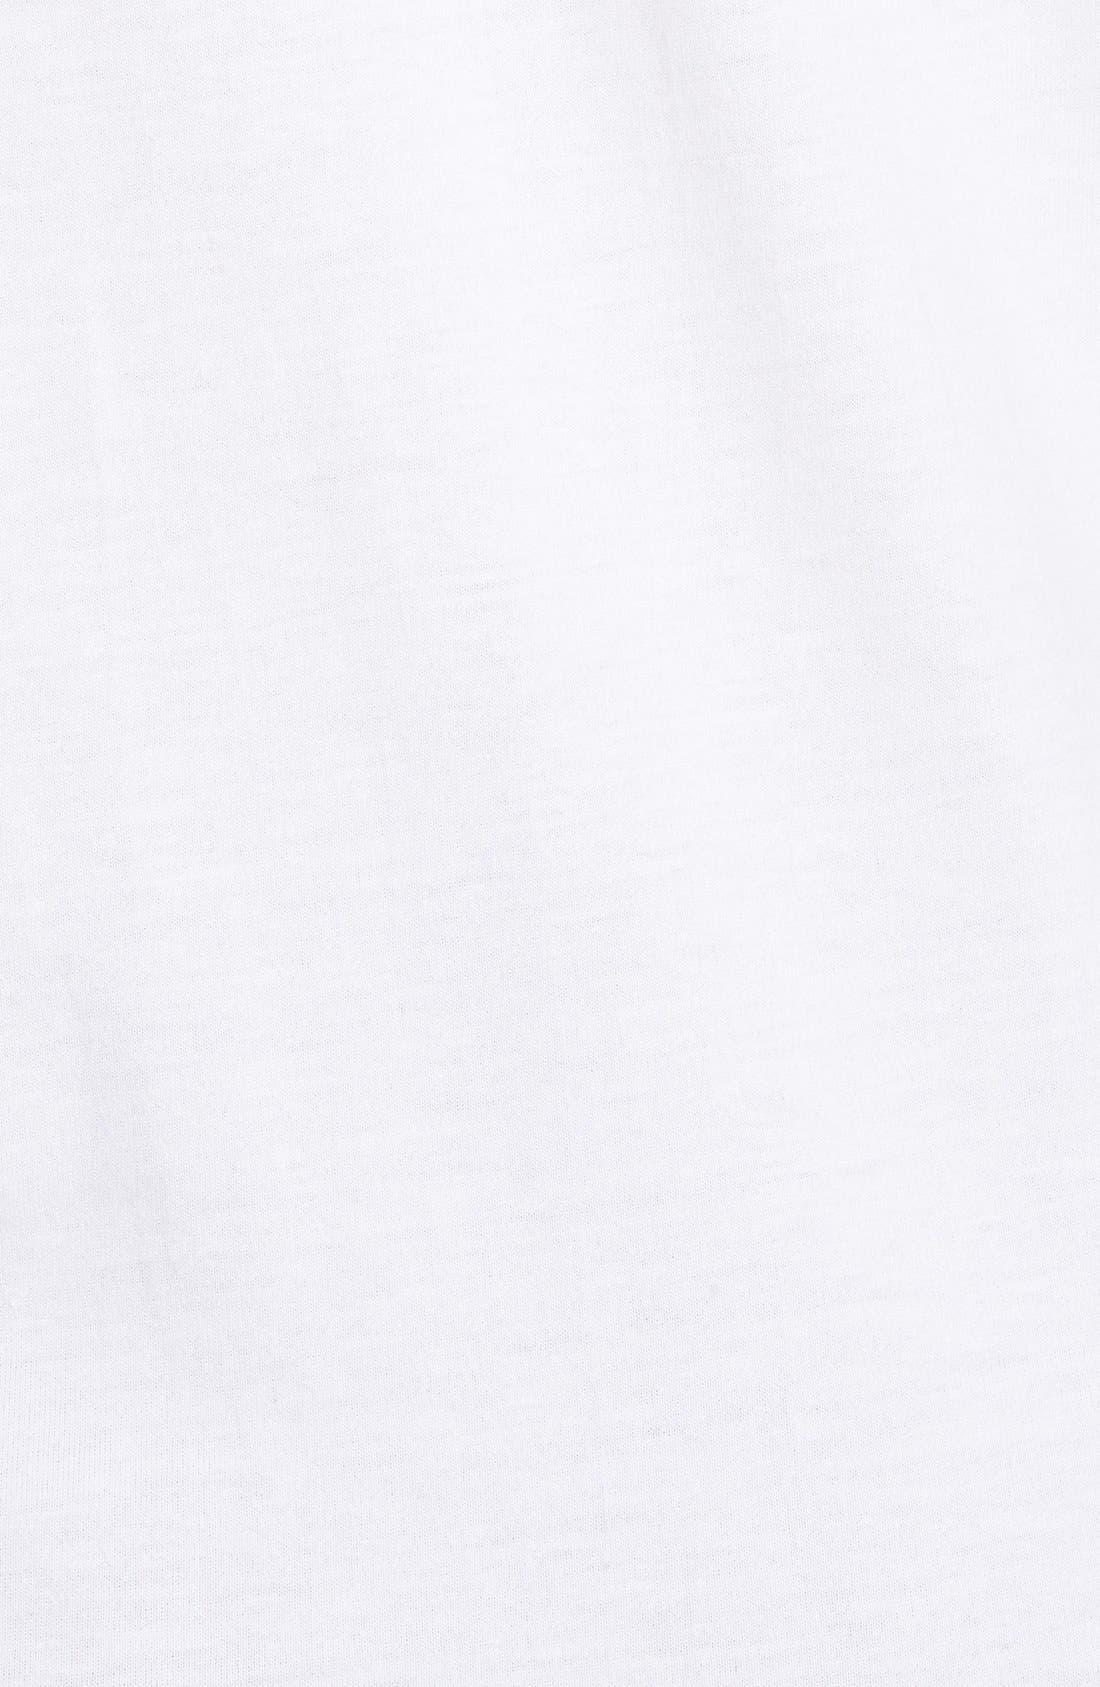 ADIDAS ORIGINALS, 'Island Superstar' Graphic T-Shirt, Alternate thumbnail 2, color, 100